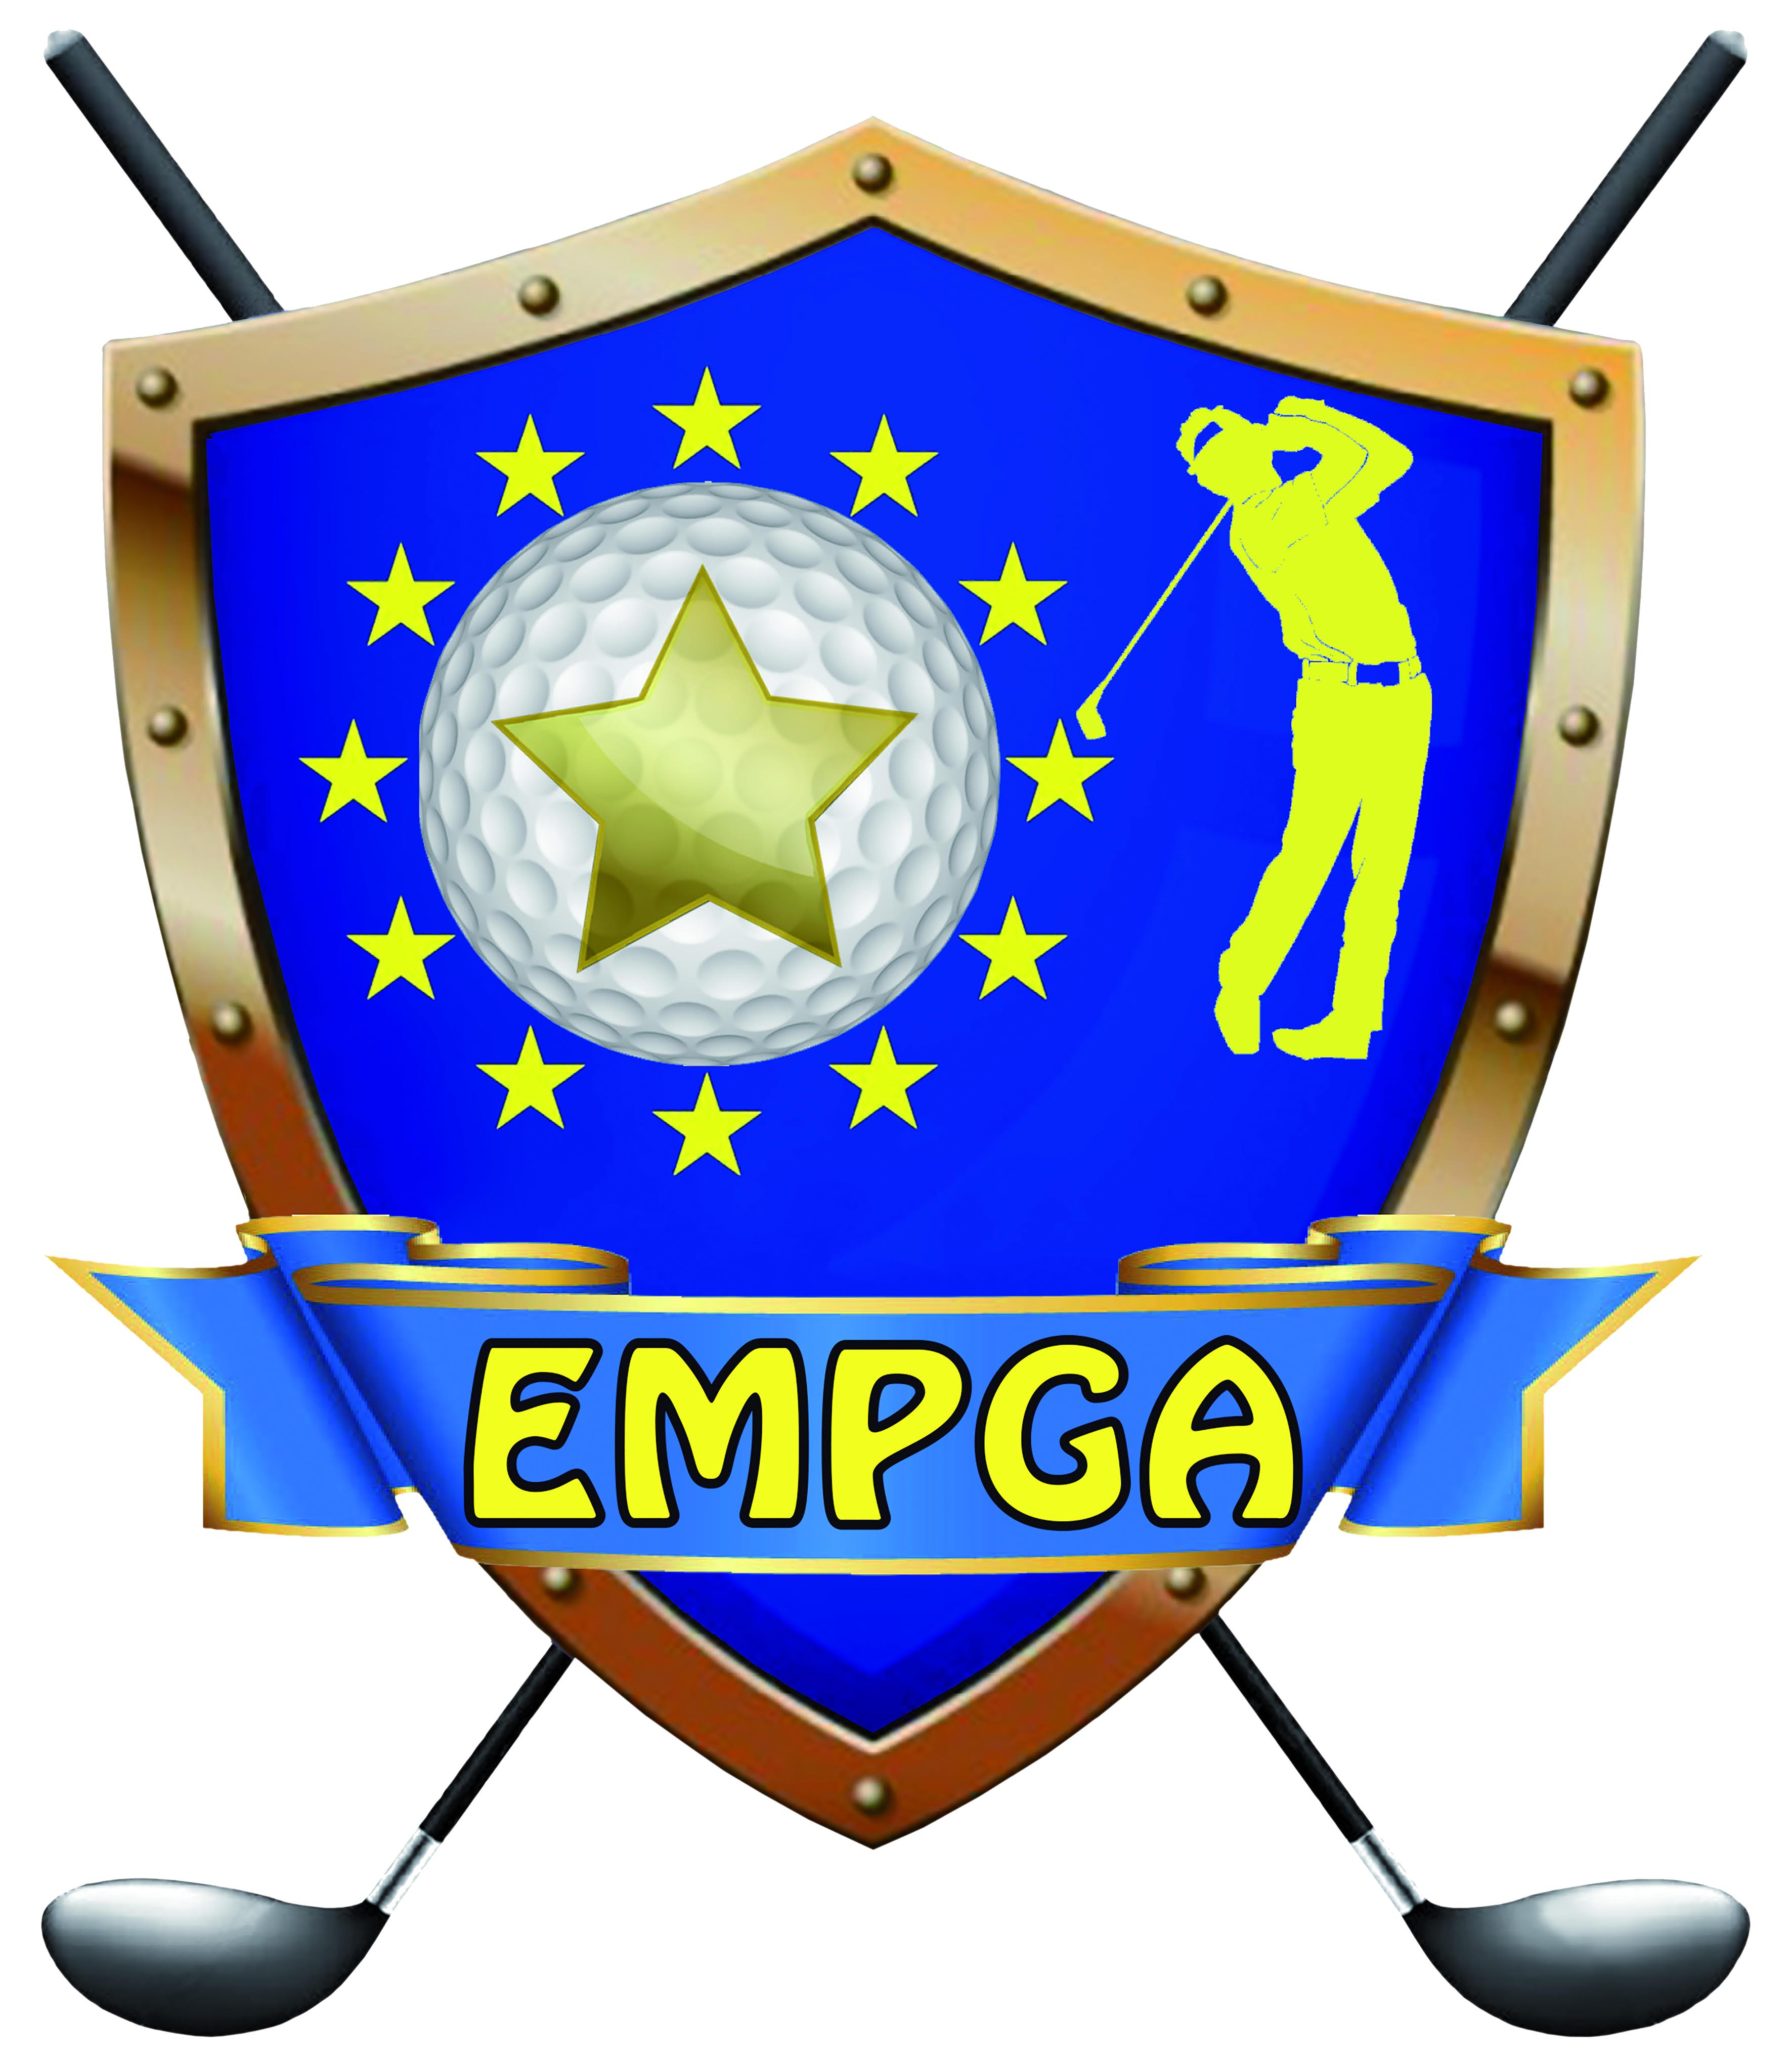 empga logo